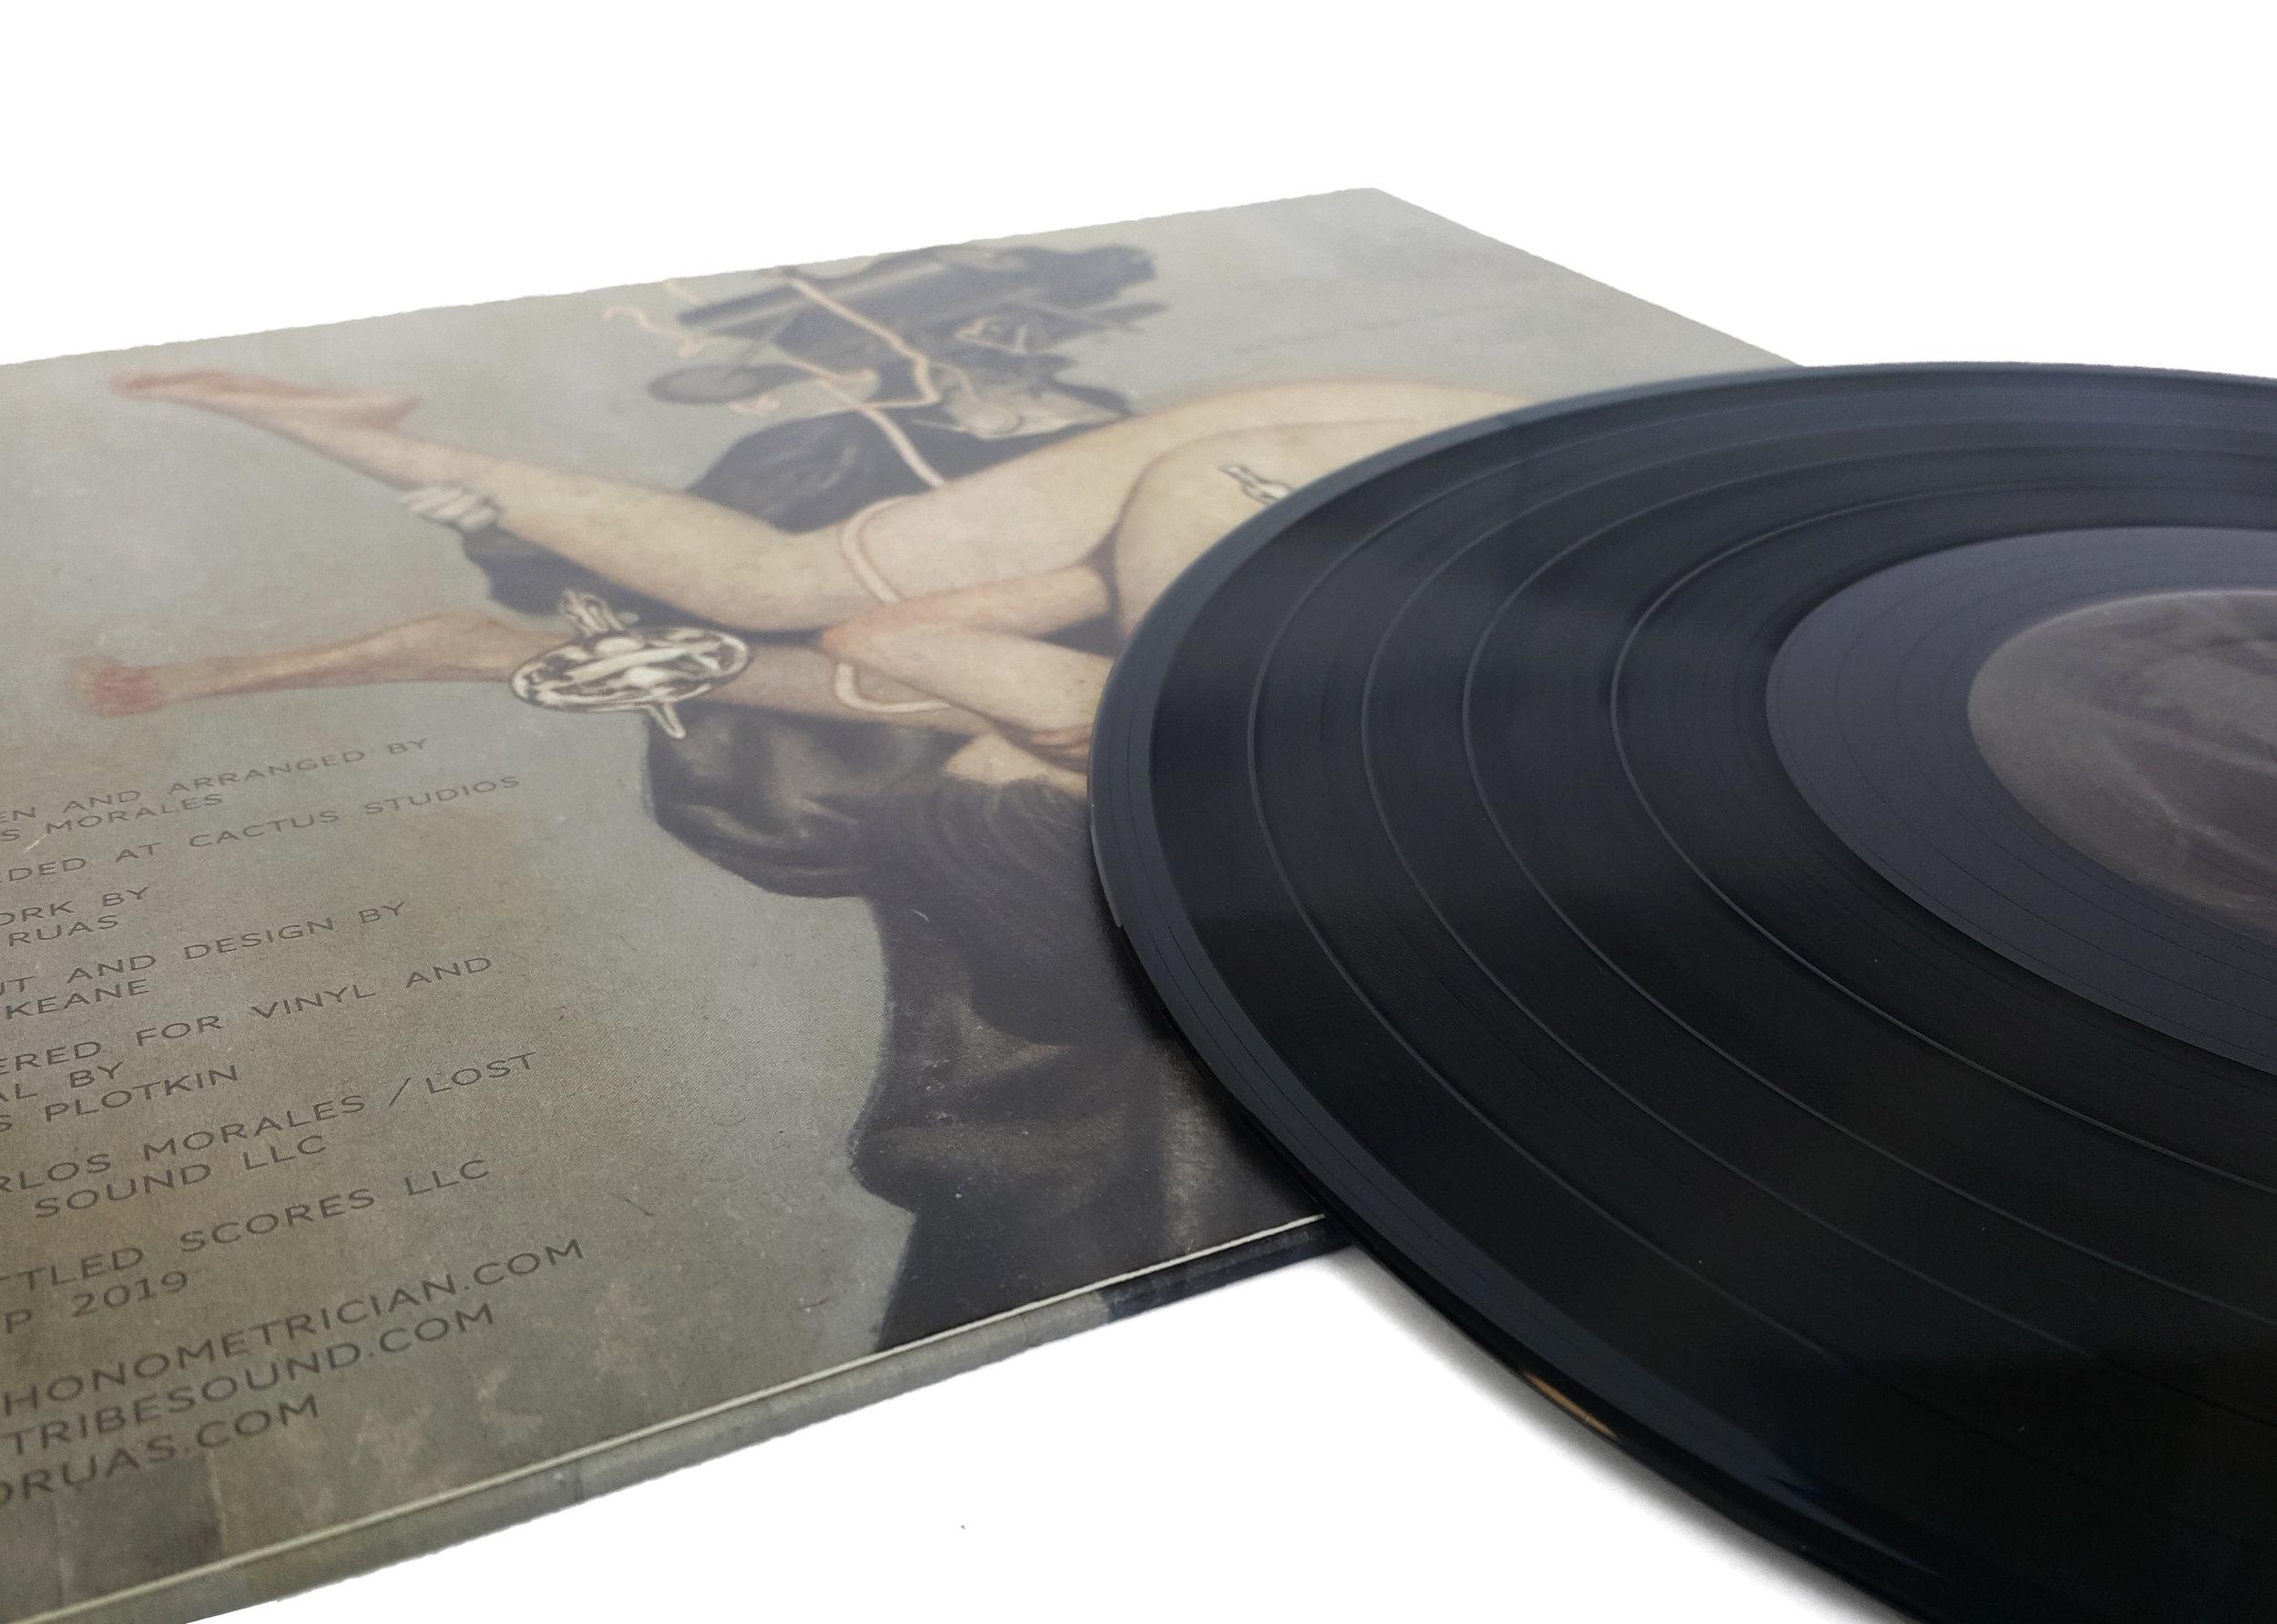 Vinyl Photo - Phonometrician 5 BEST BRIGHTEST.jpg